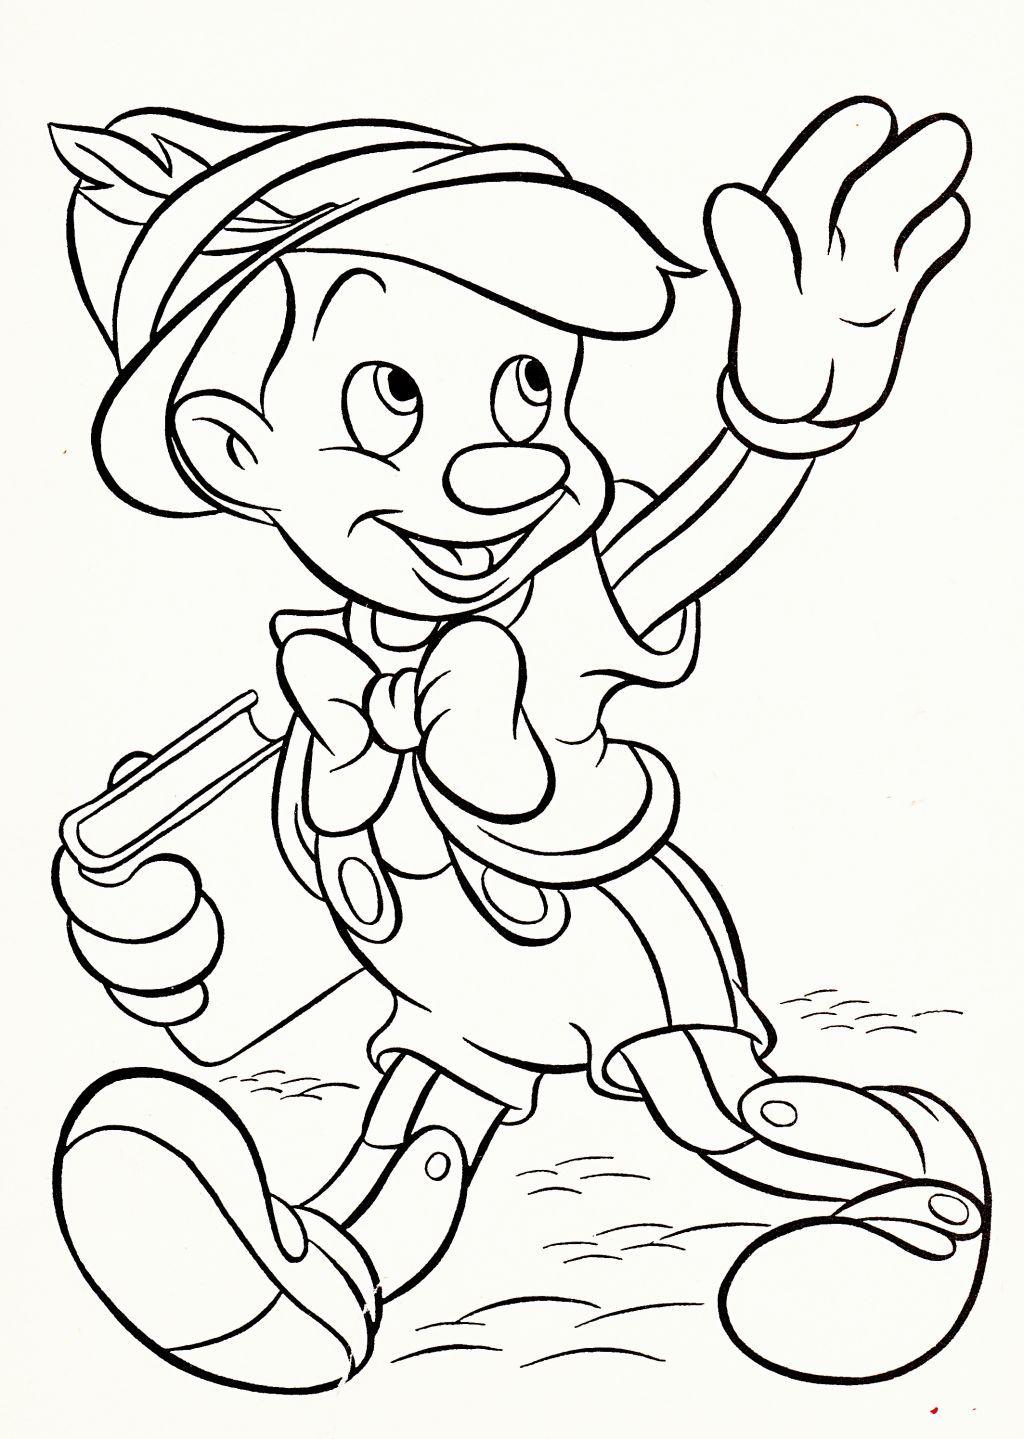 Disney Characters Coloring Disney Coloring Pages Disney Coloring Pages Printables Disney Coloring Sheets